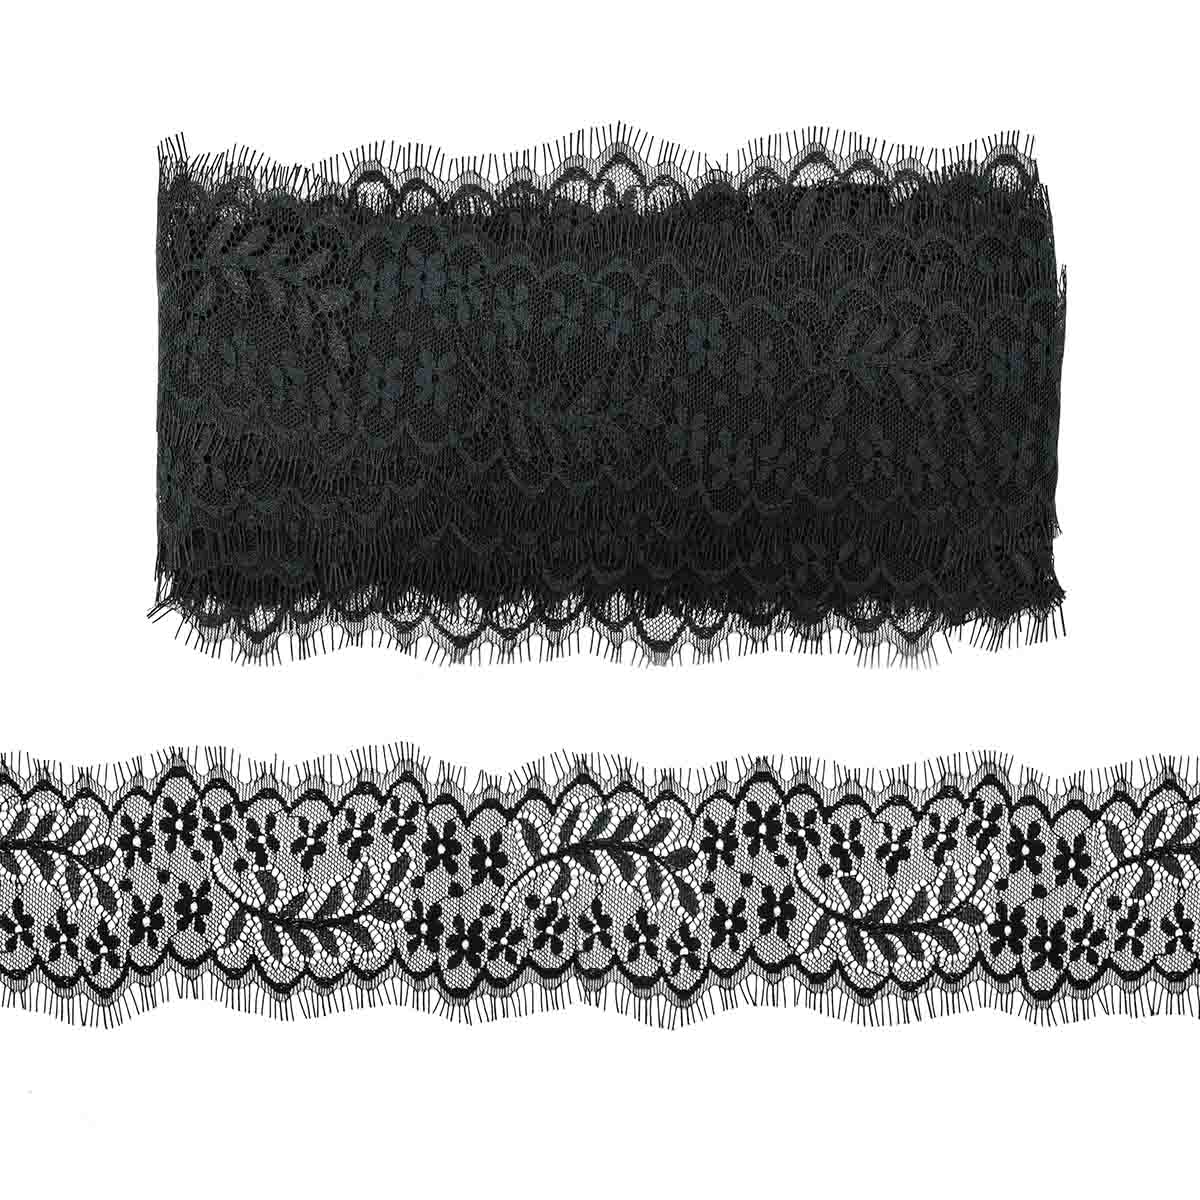 SJ061 Кружево 'Шантильи' на сетке 8,0см*15м